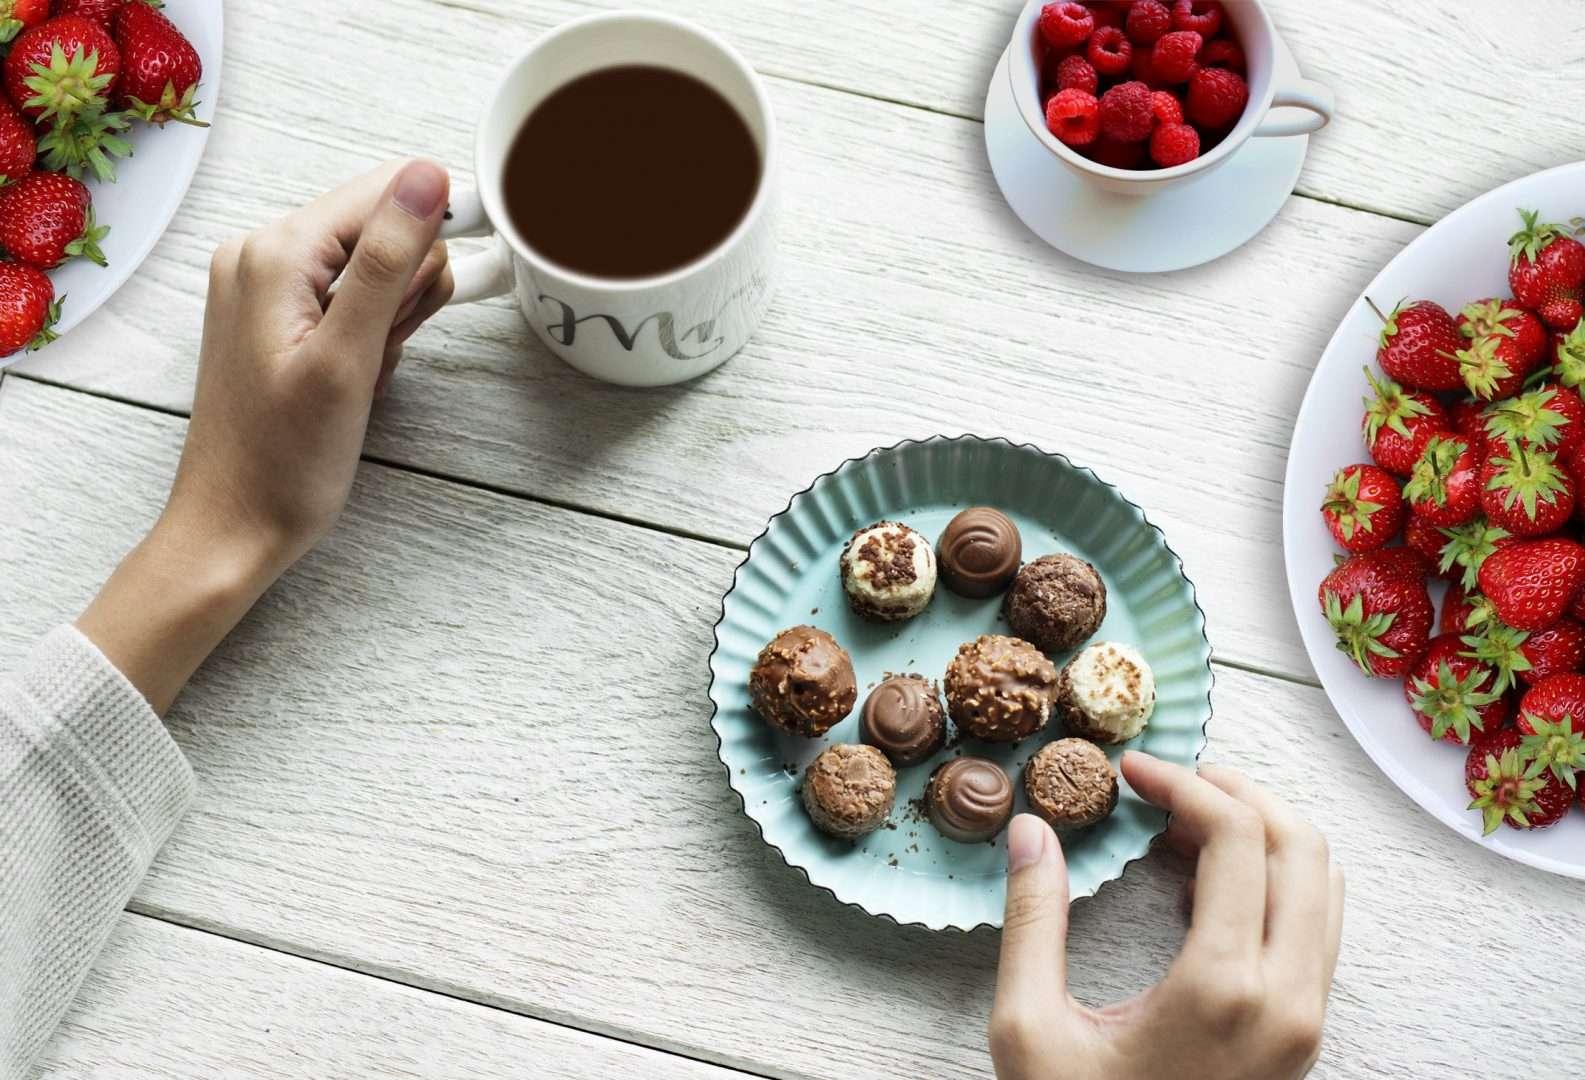 mezza mattinata e dieta snack